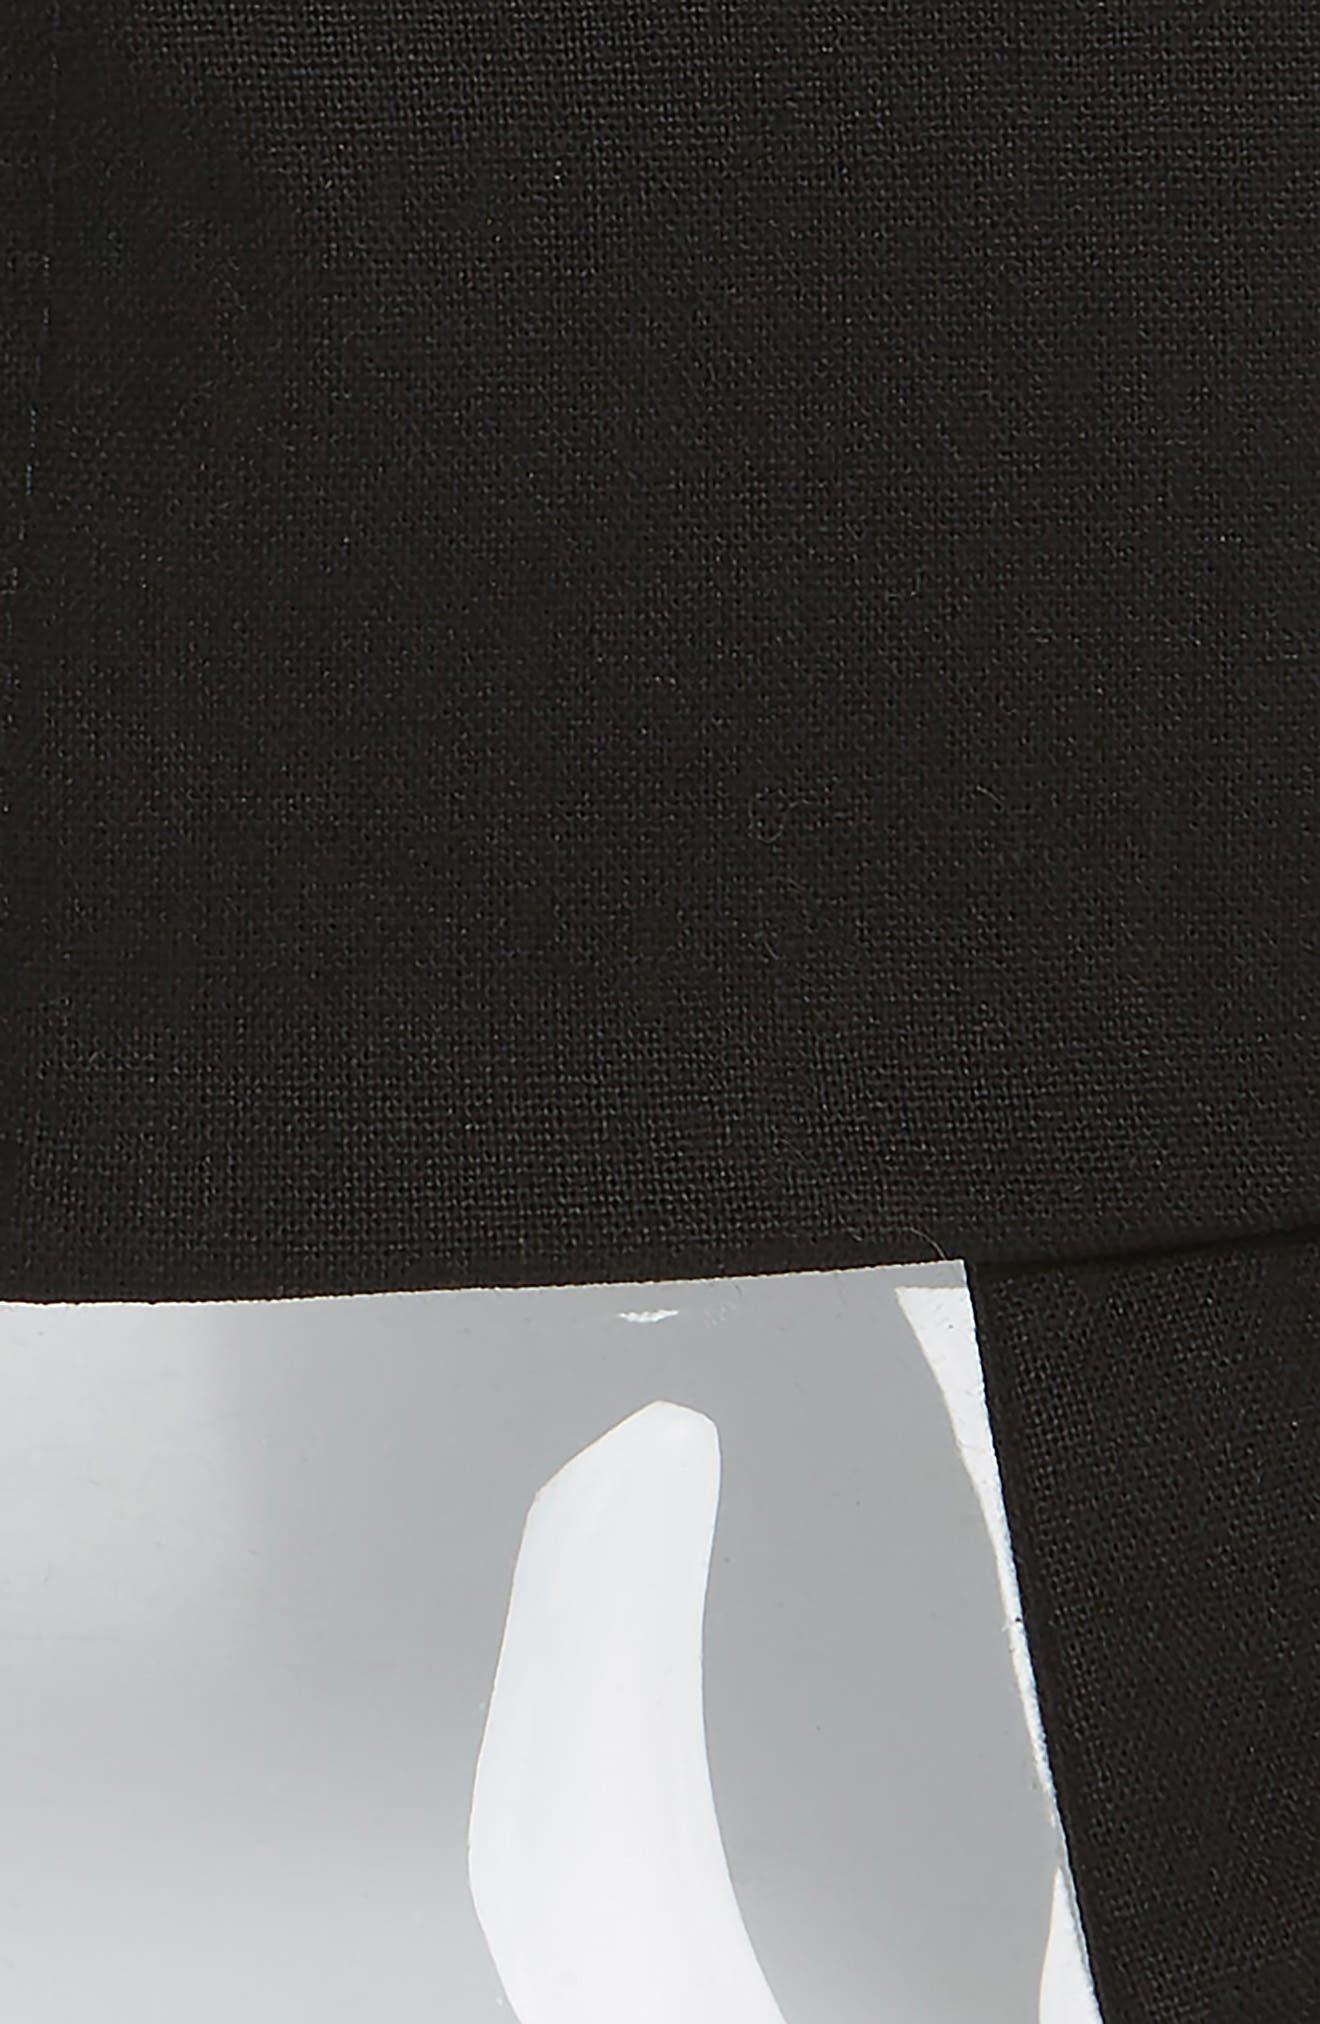 STEVE MADDEN, Transparent Panel Canvas Bucket Hat, Alternate thumbnail 2, color, BLACK